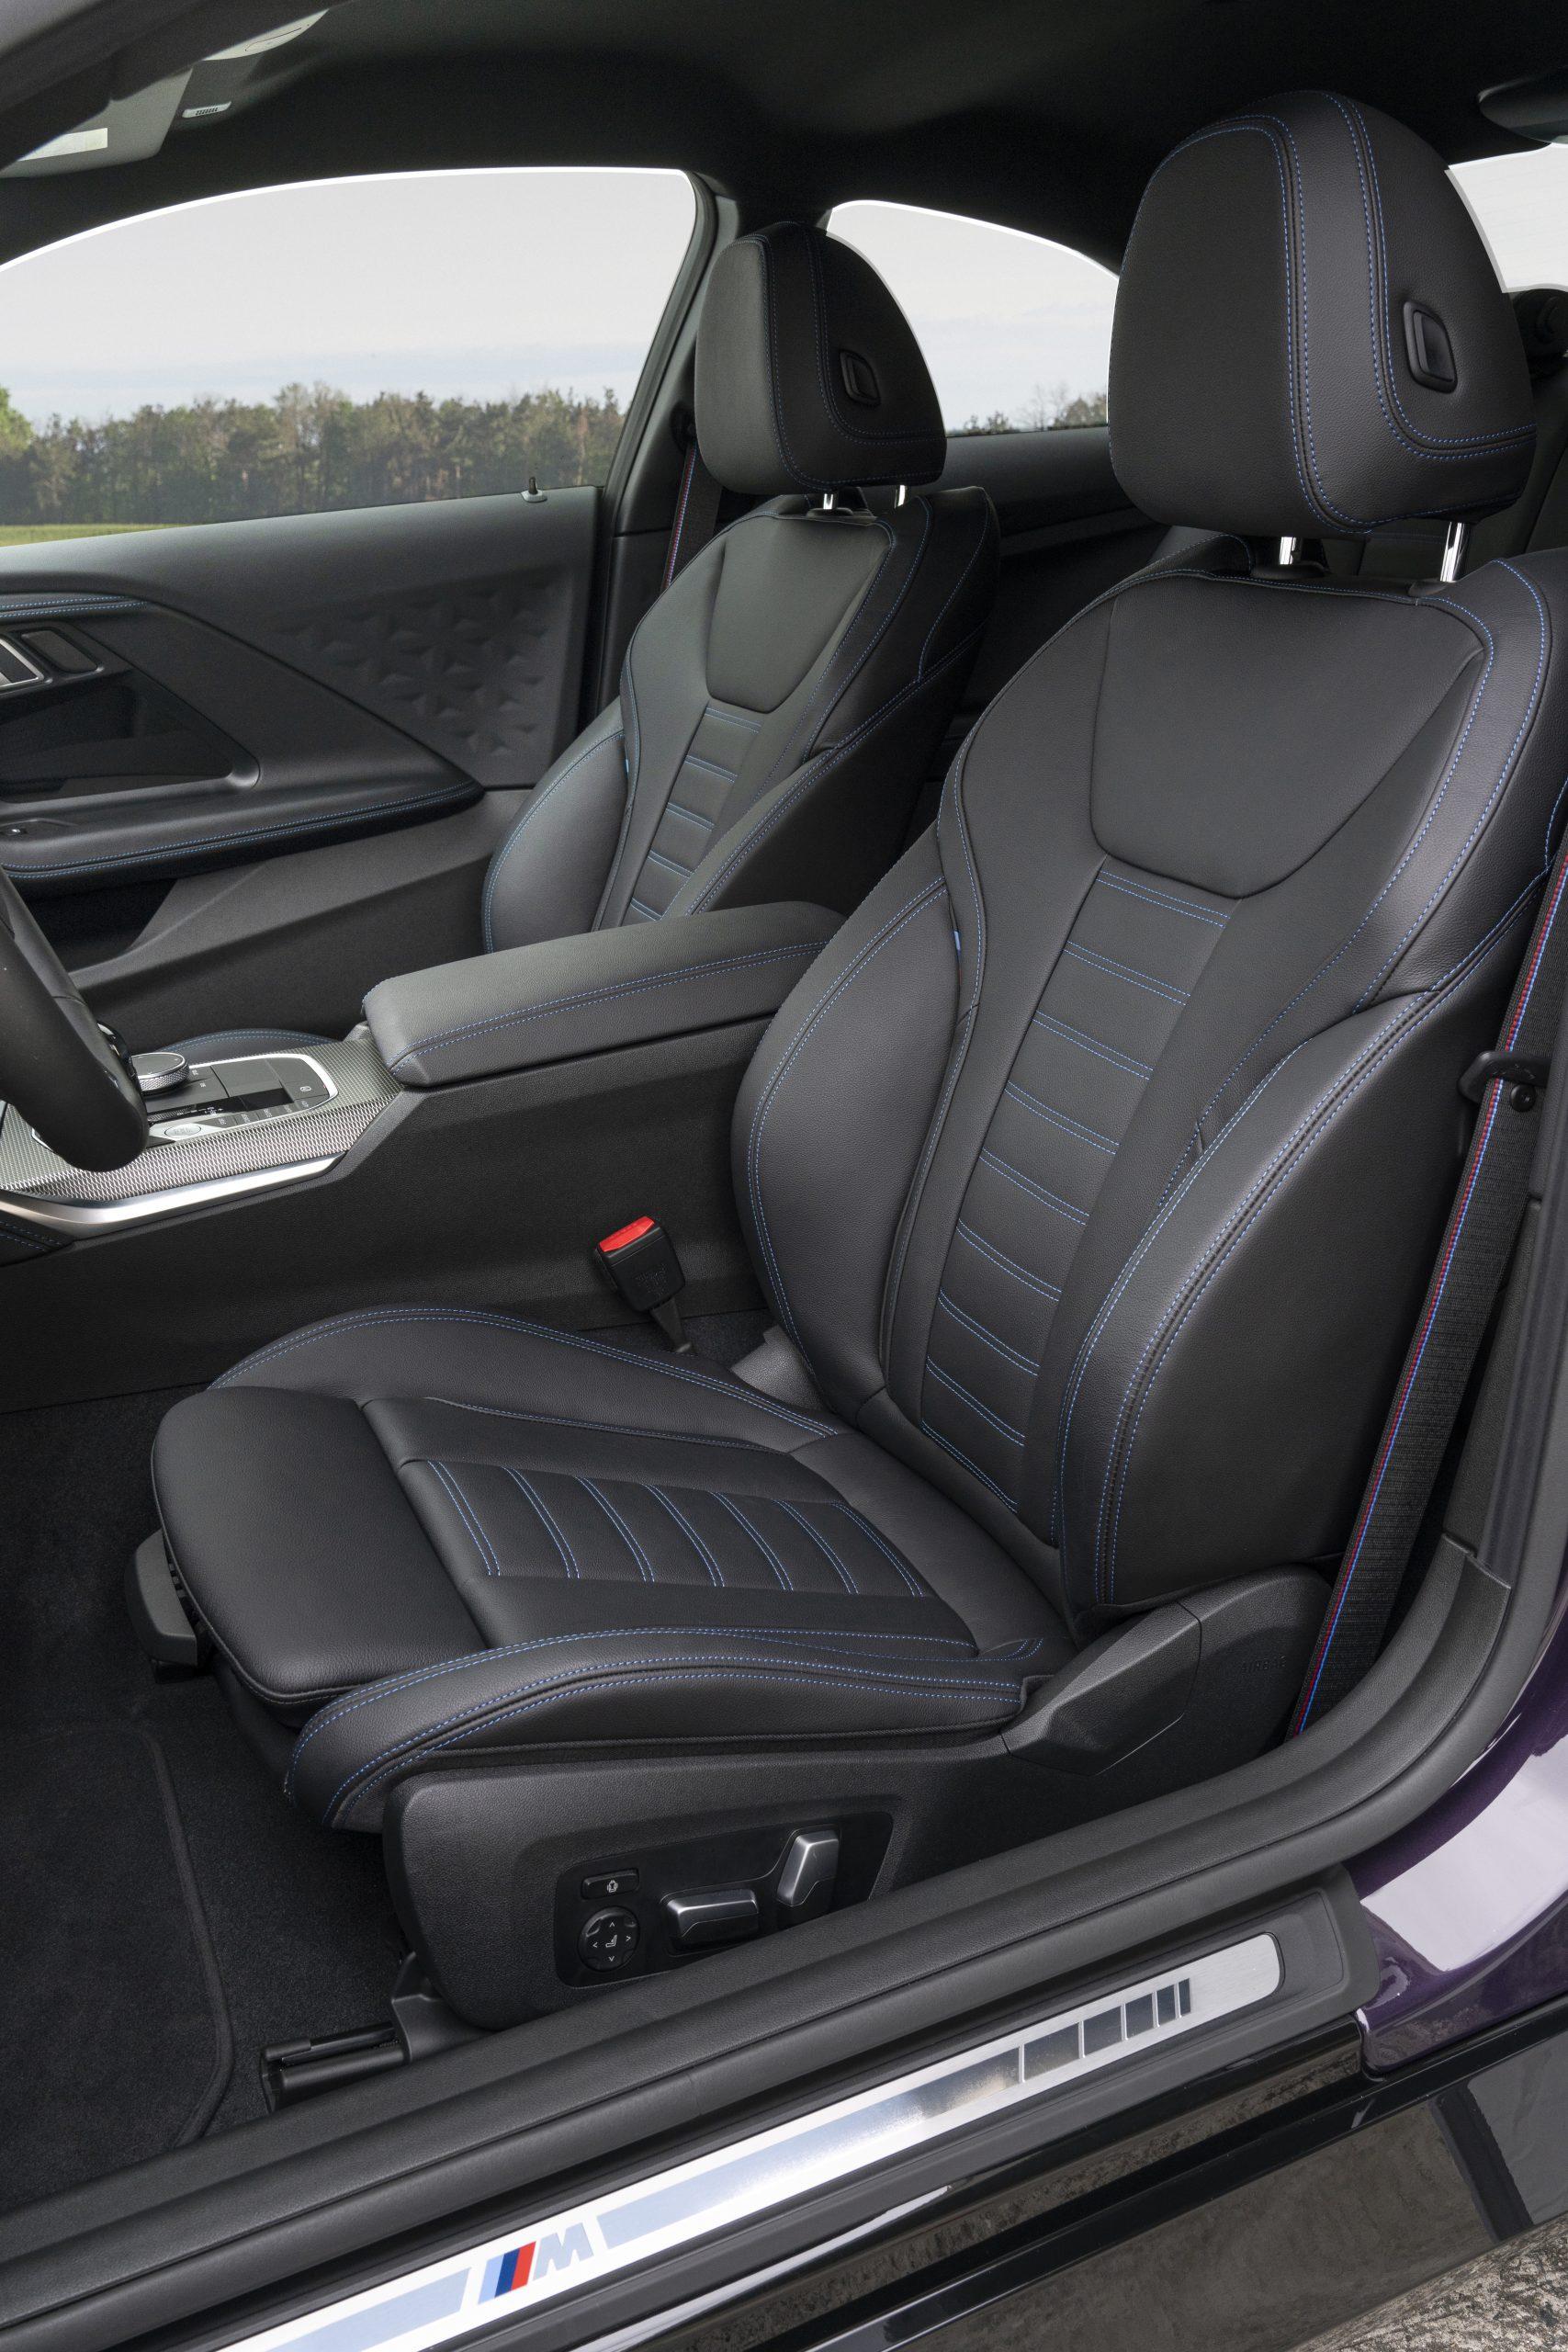 P90428483 highRes scaled Αυτή είναι η νέα BMW Σειρά 2 Coupe BMW, Bmw 2, BMW Σειρά 2, zblog, ειδήσεις, Νέα, Σειρά 2